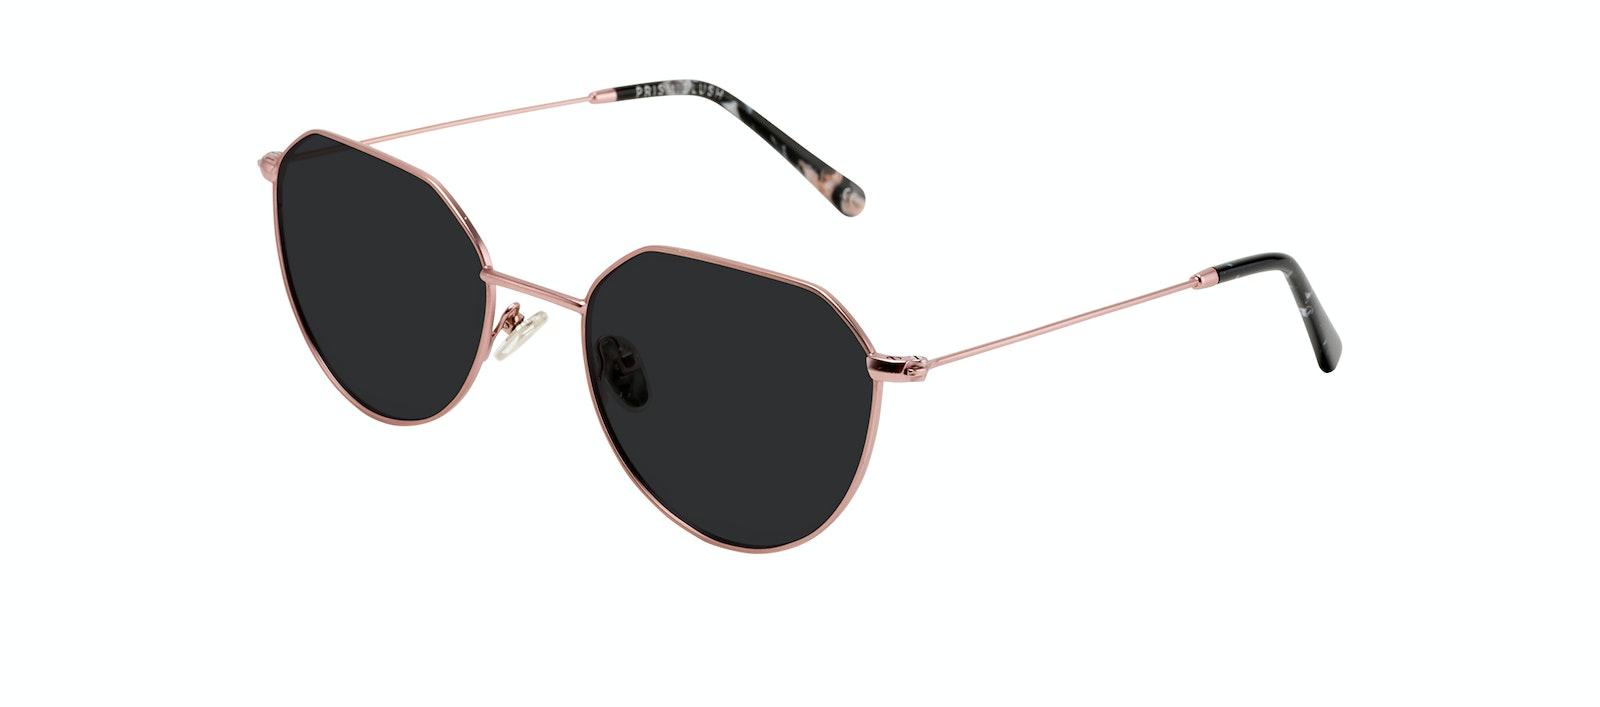 Affordable Fashion Glasses Round Sunglasses Women Prism Blush Tilt